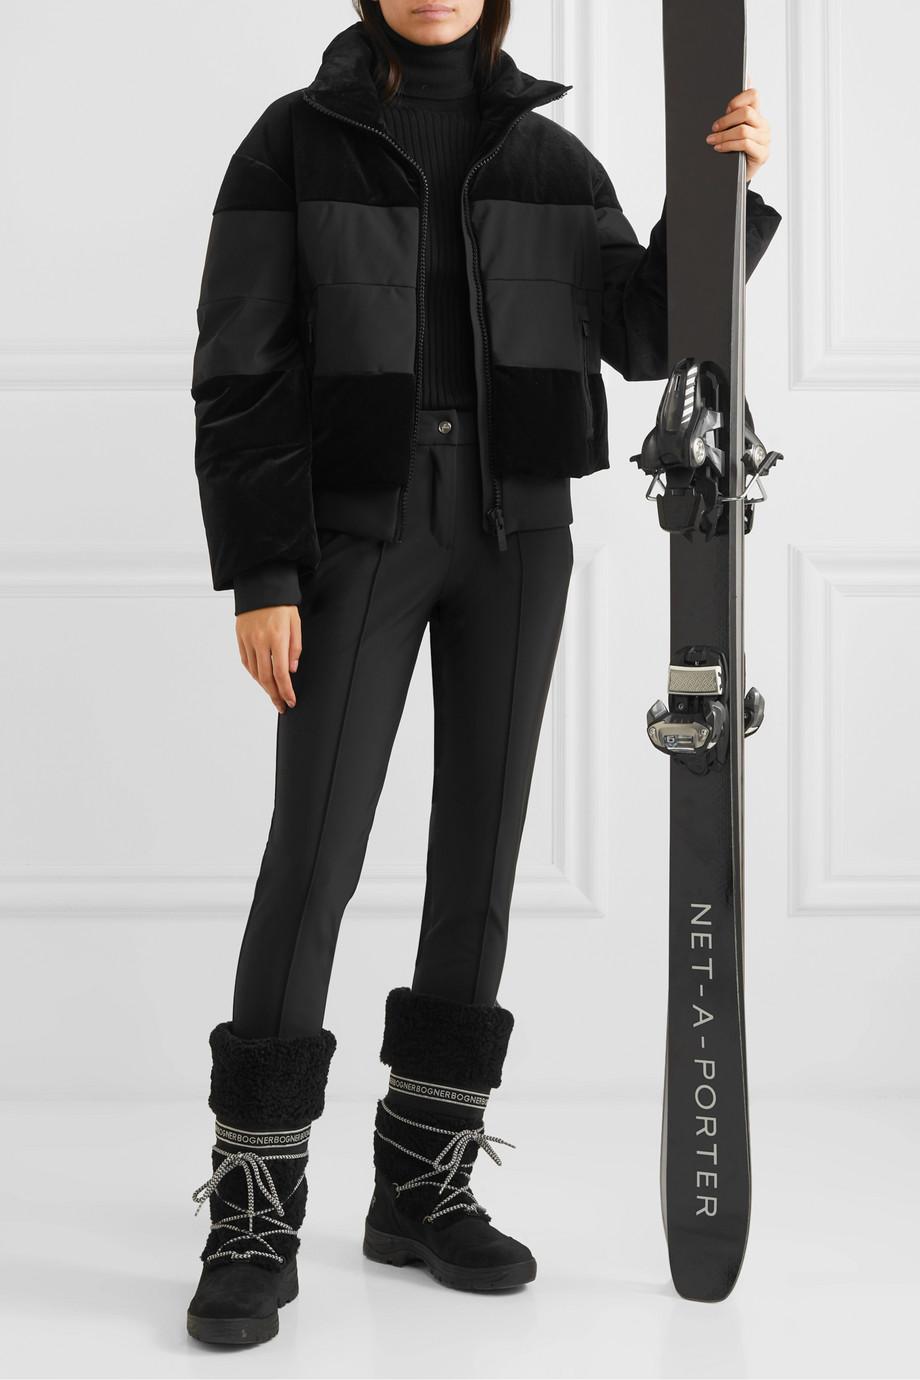 Fusalp Pantalon de ski fuseau en tissu technique Belalp